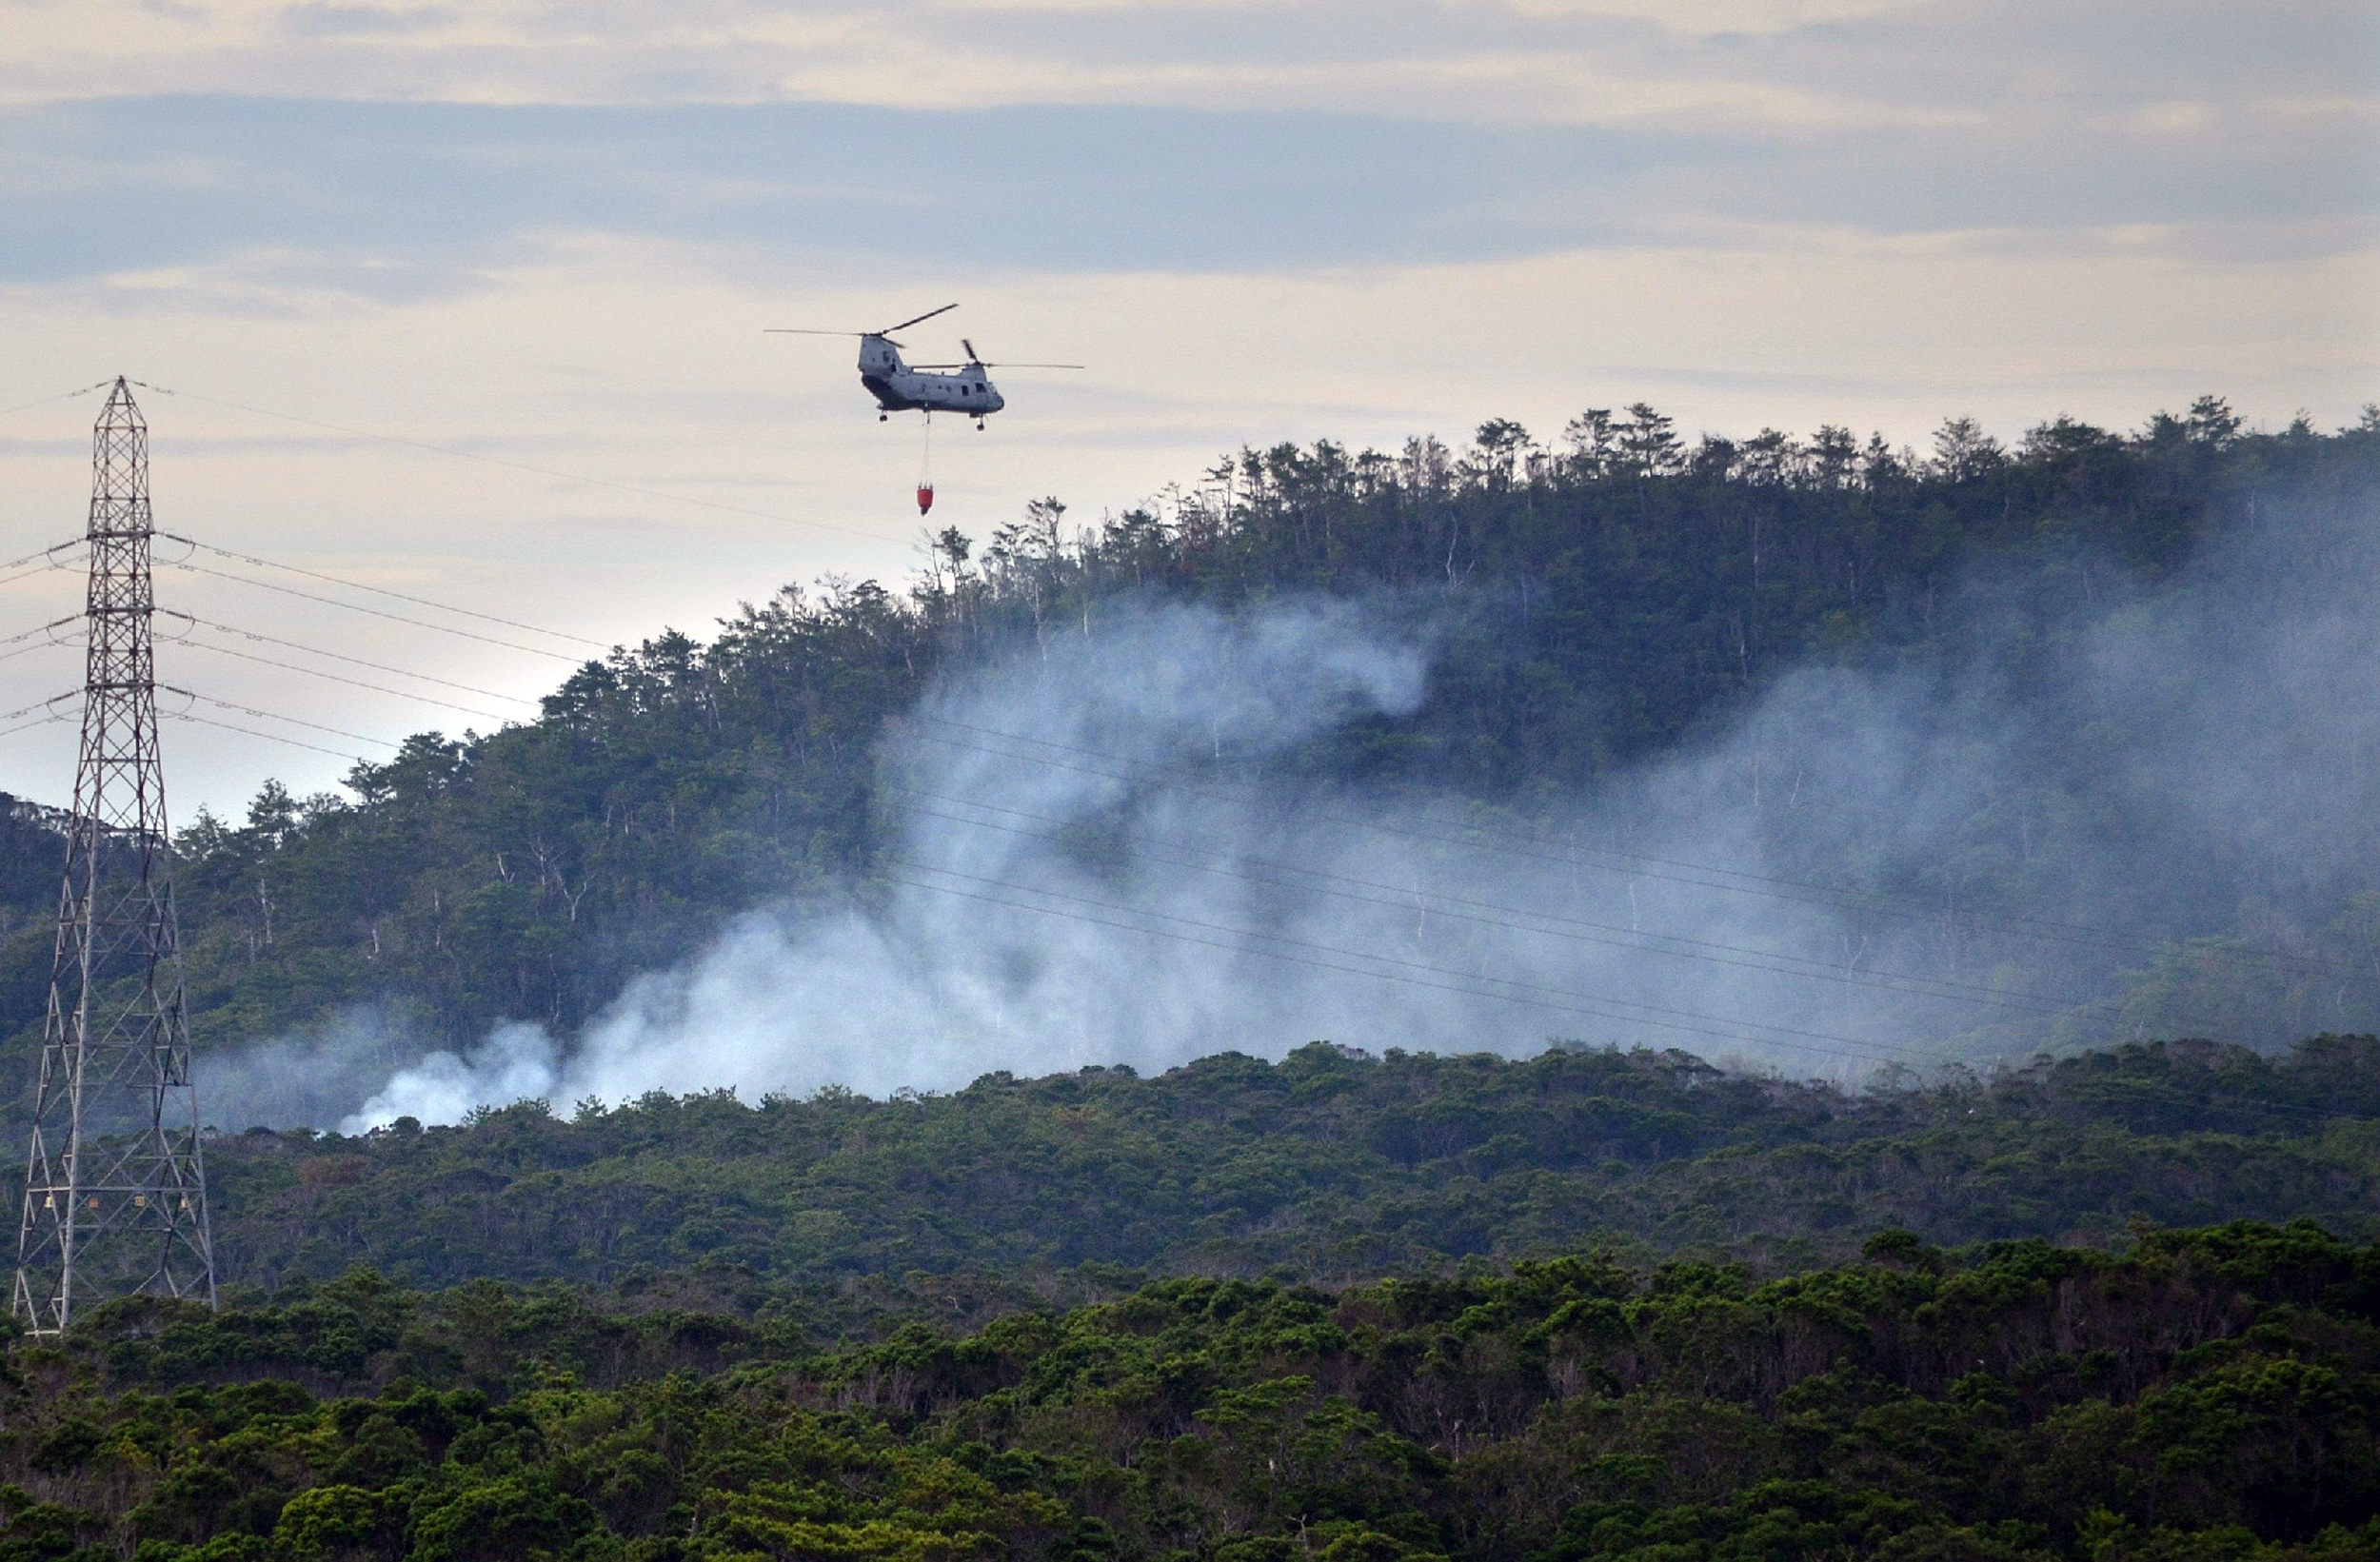 U.S. military helicopter crashes during training exercise ...